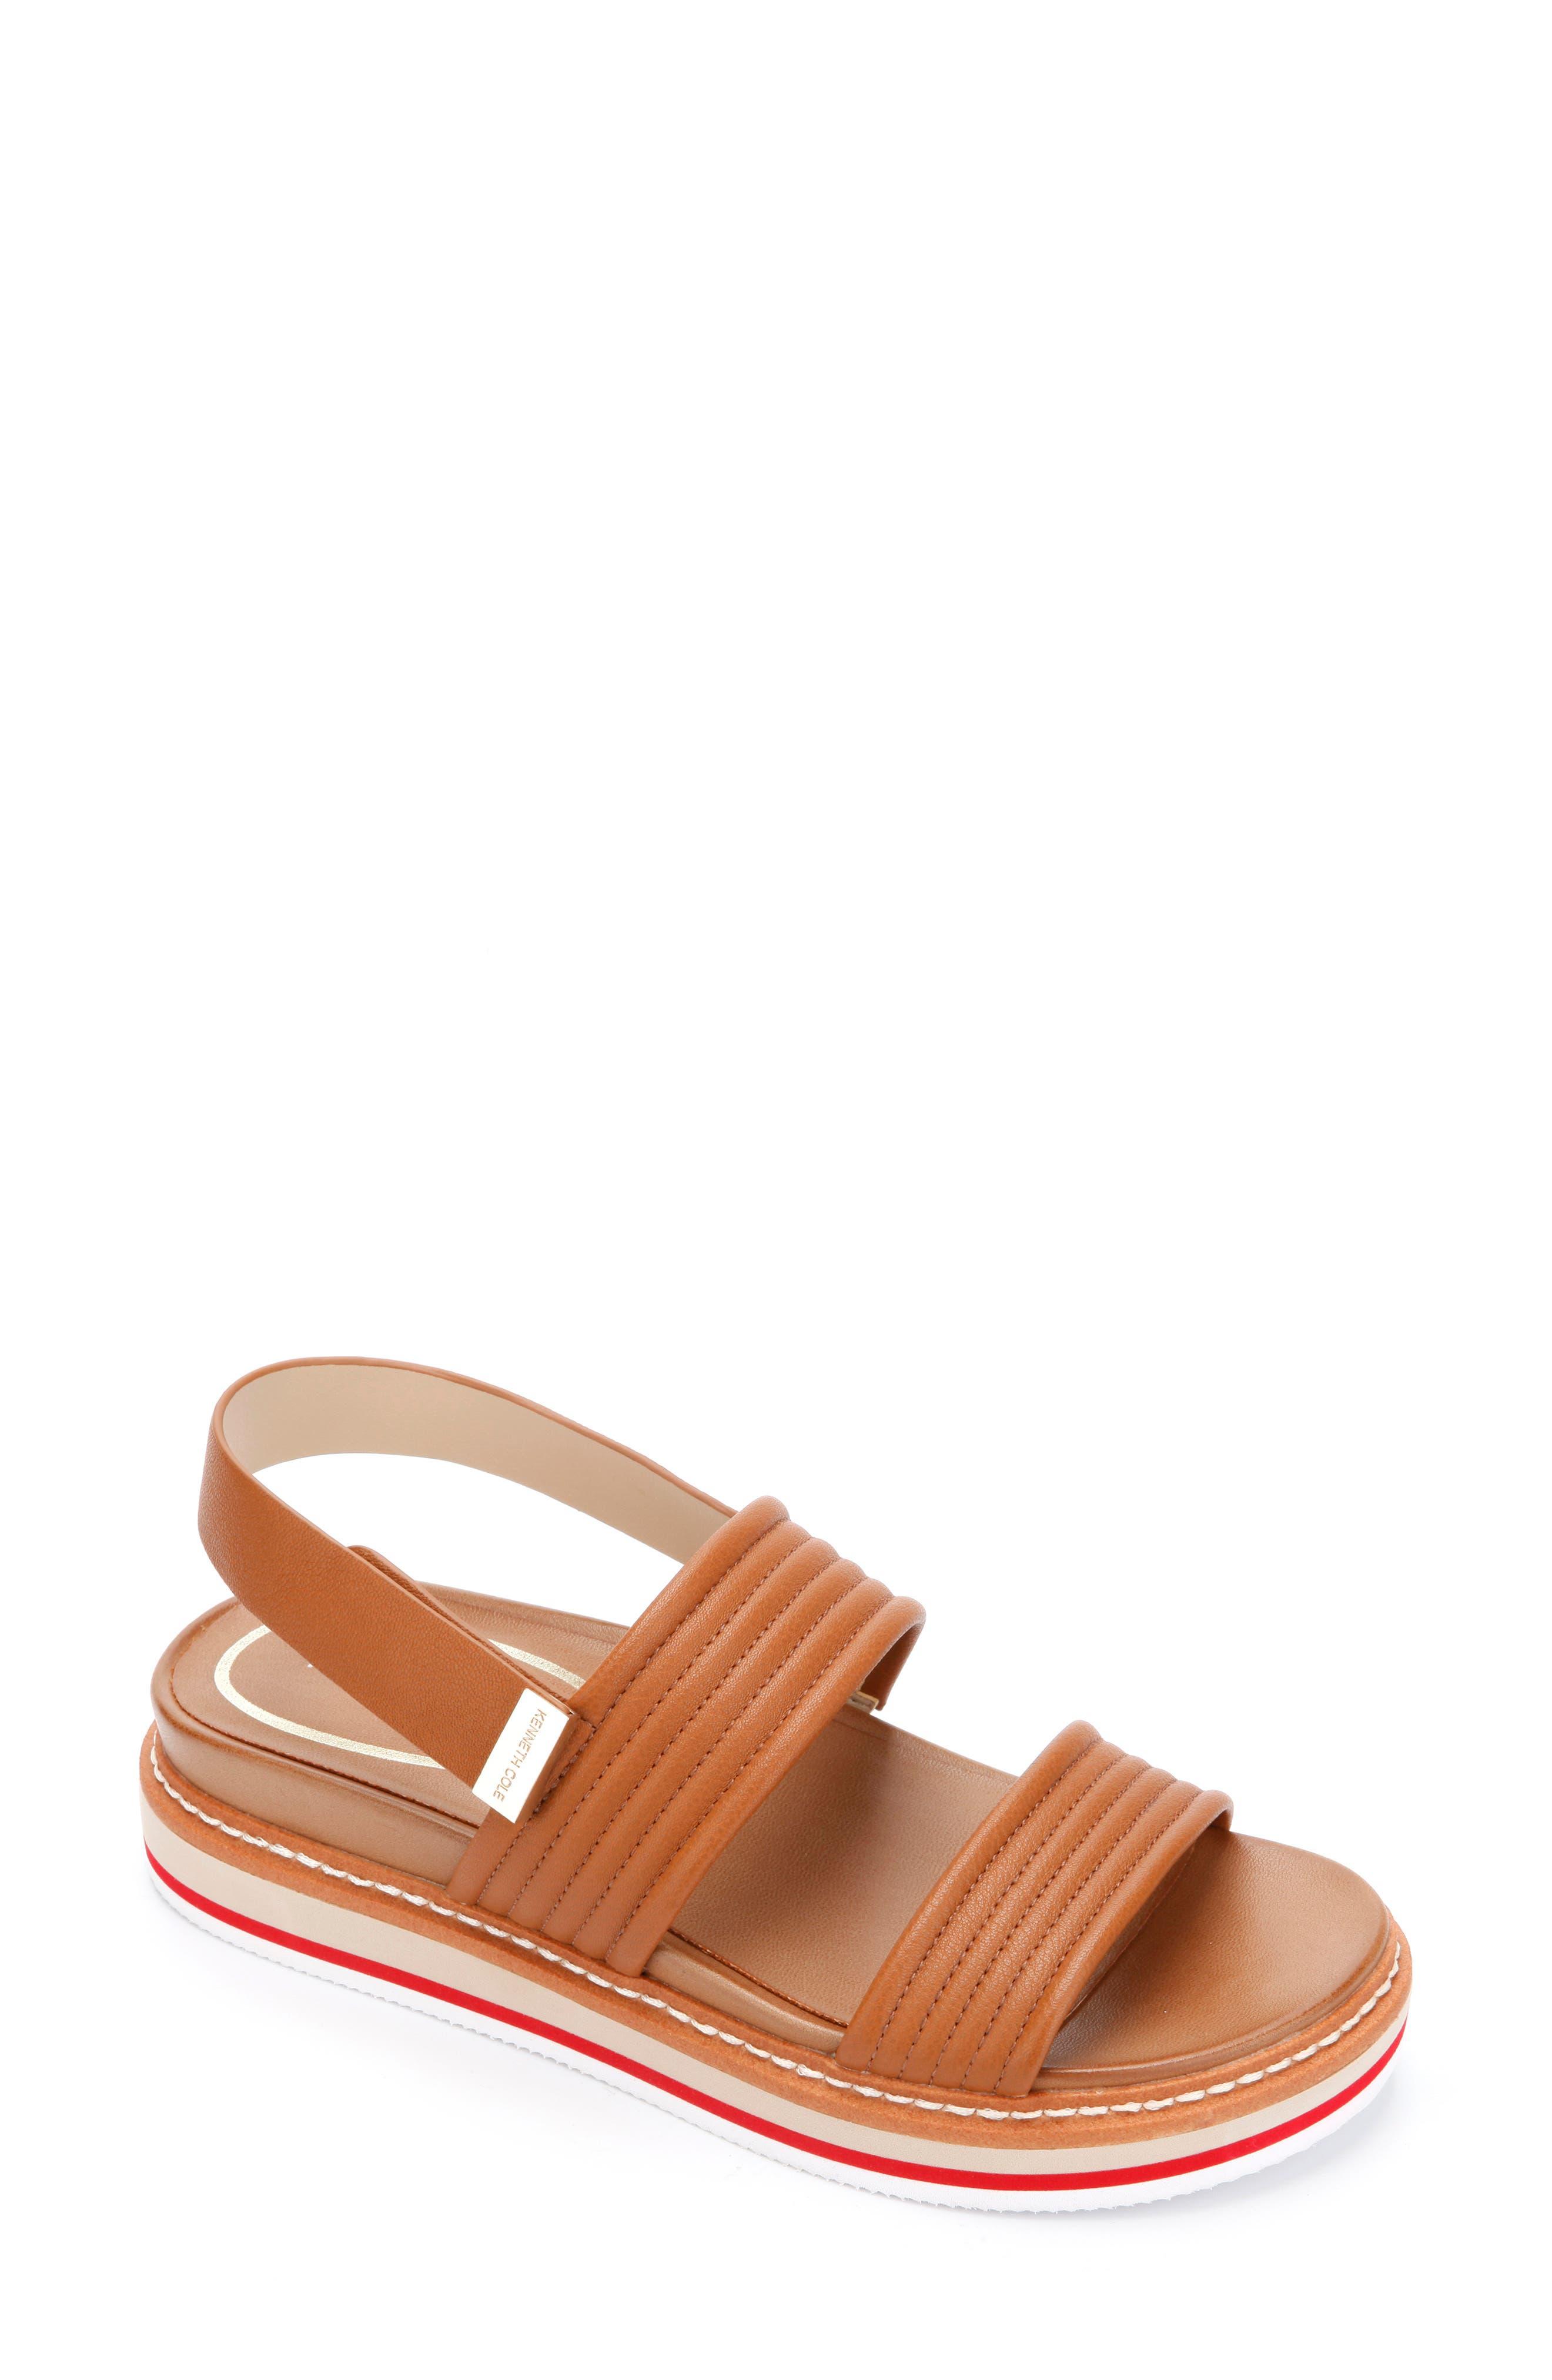 Laney Simple Sandal